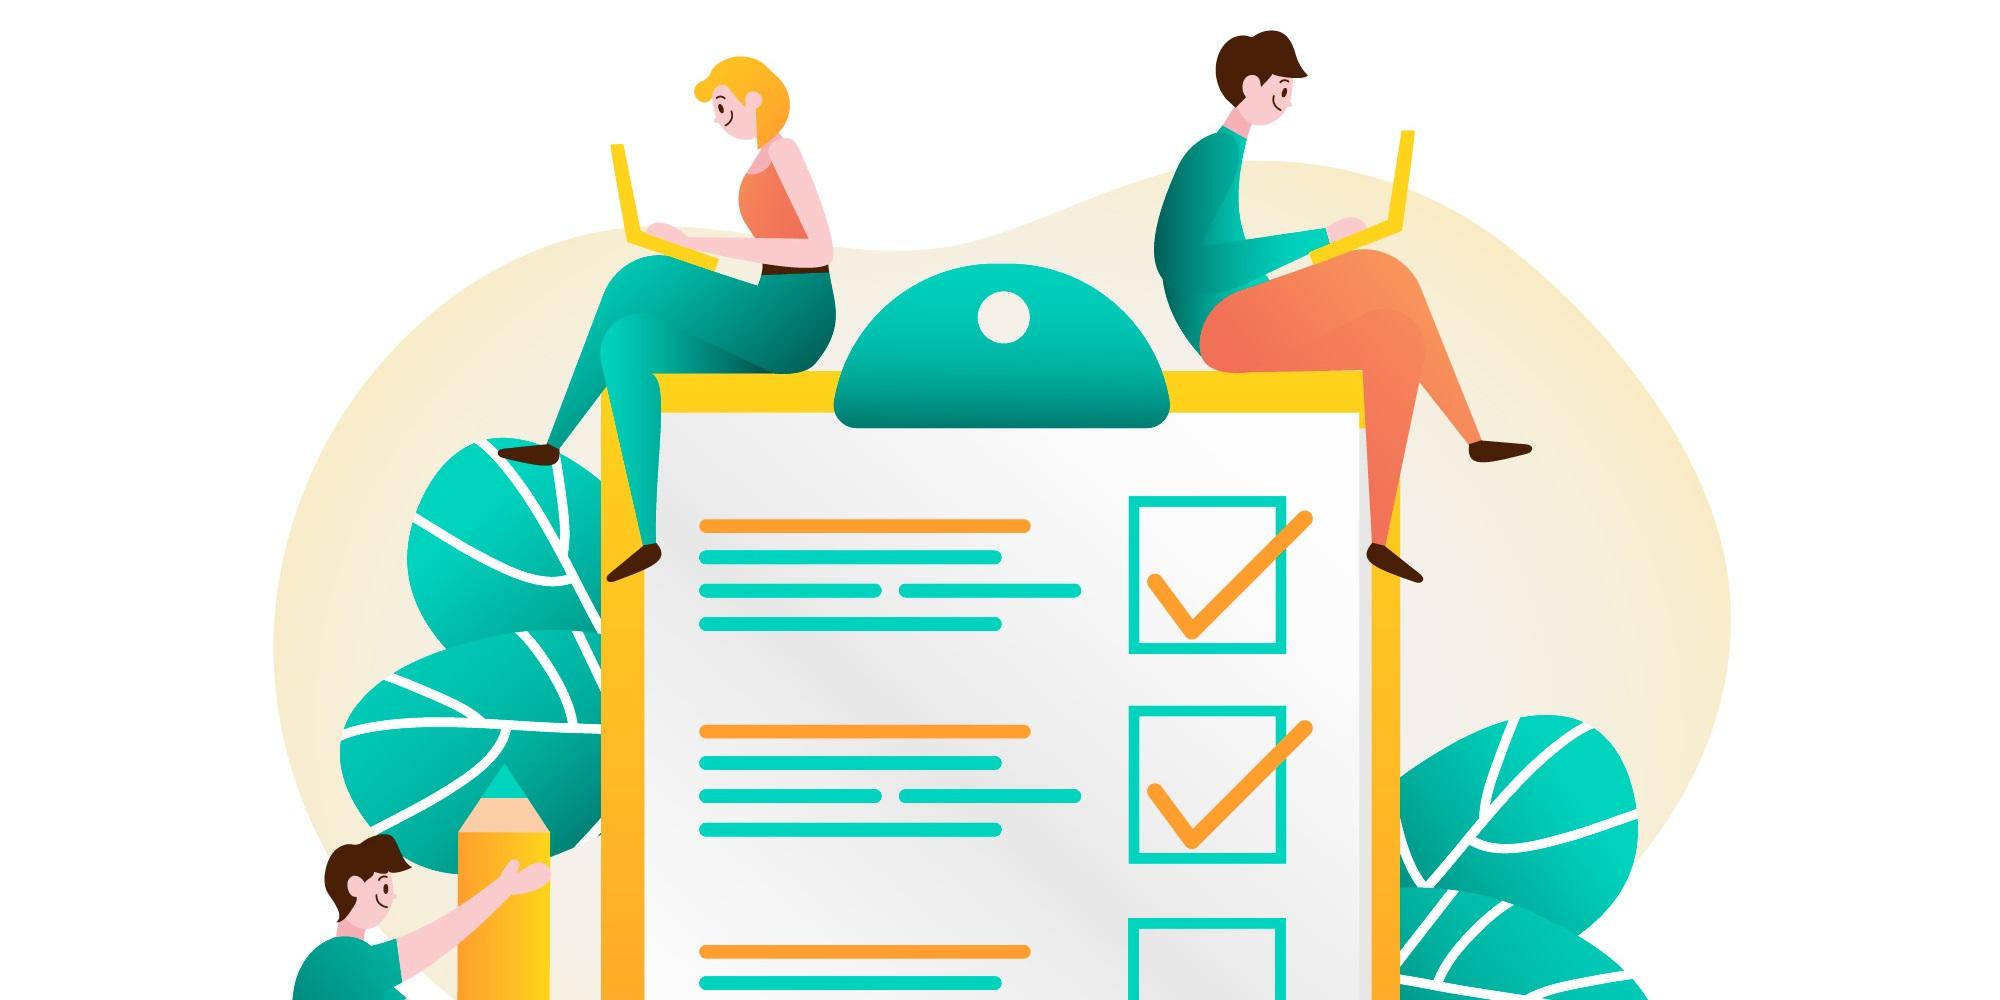 Screen Sharing Checklist